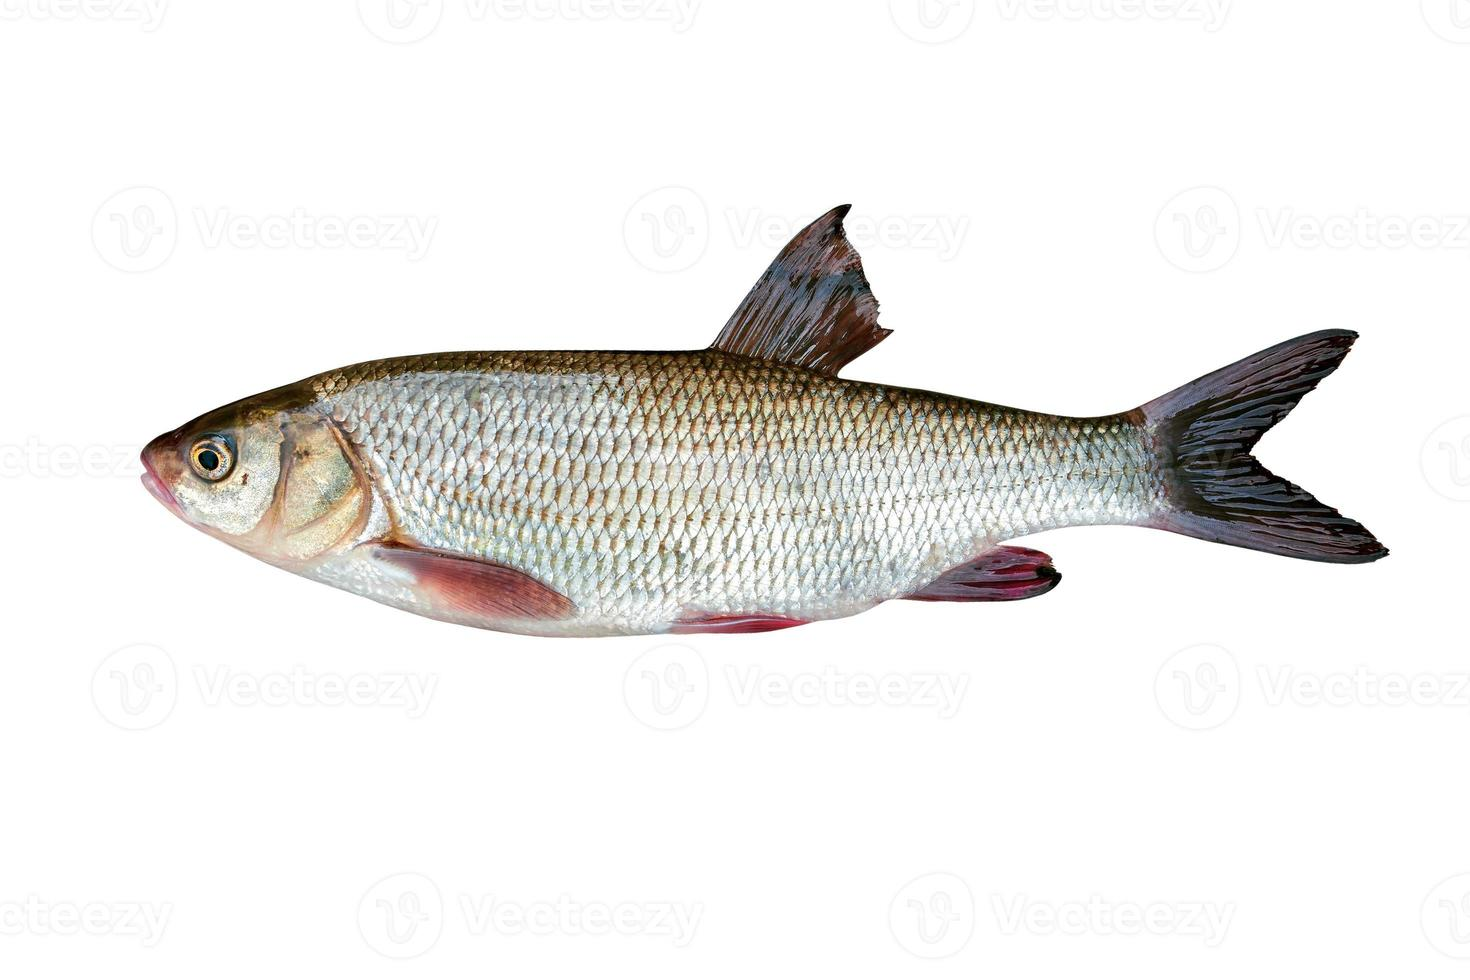 ide de peces de agua dulce foto